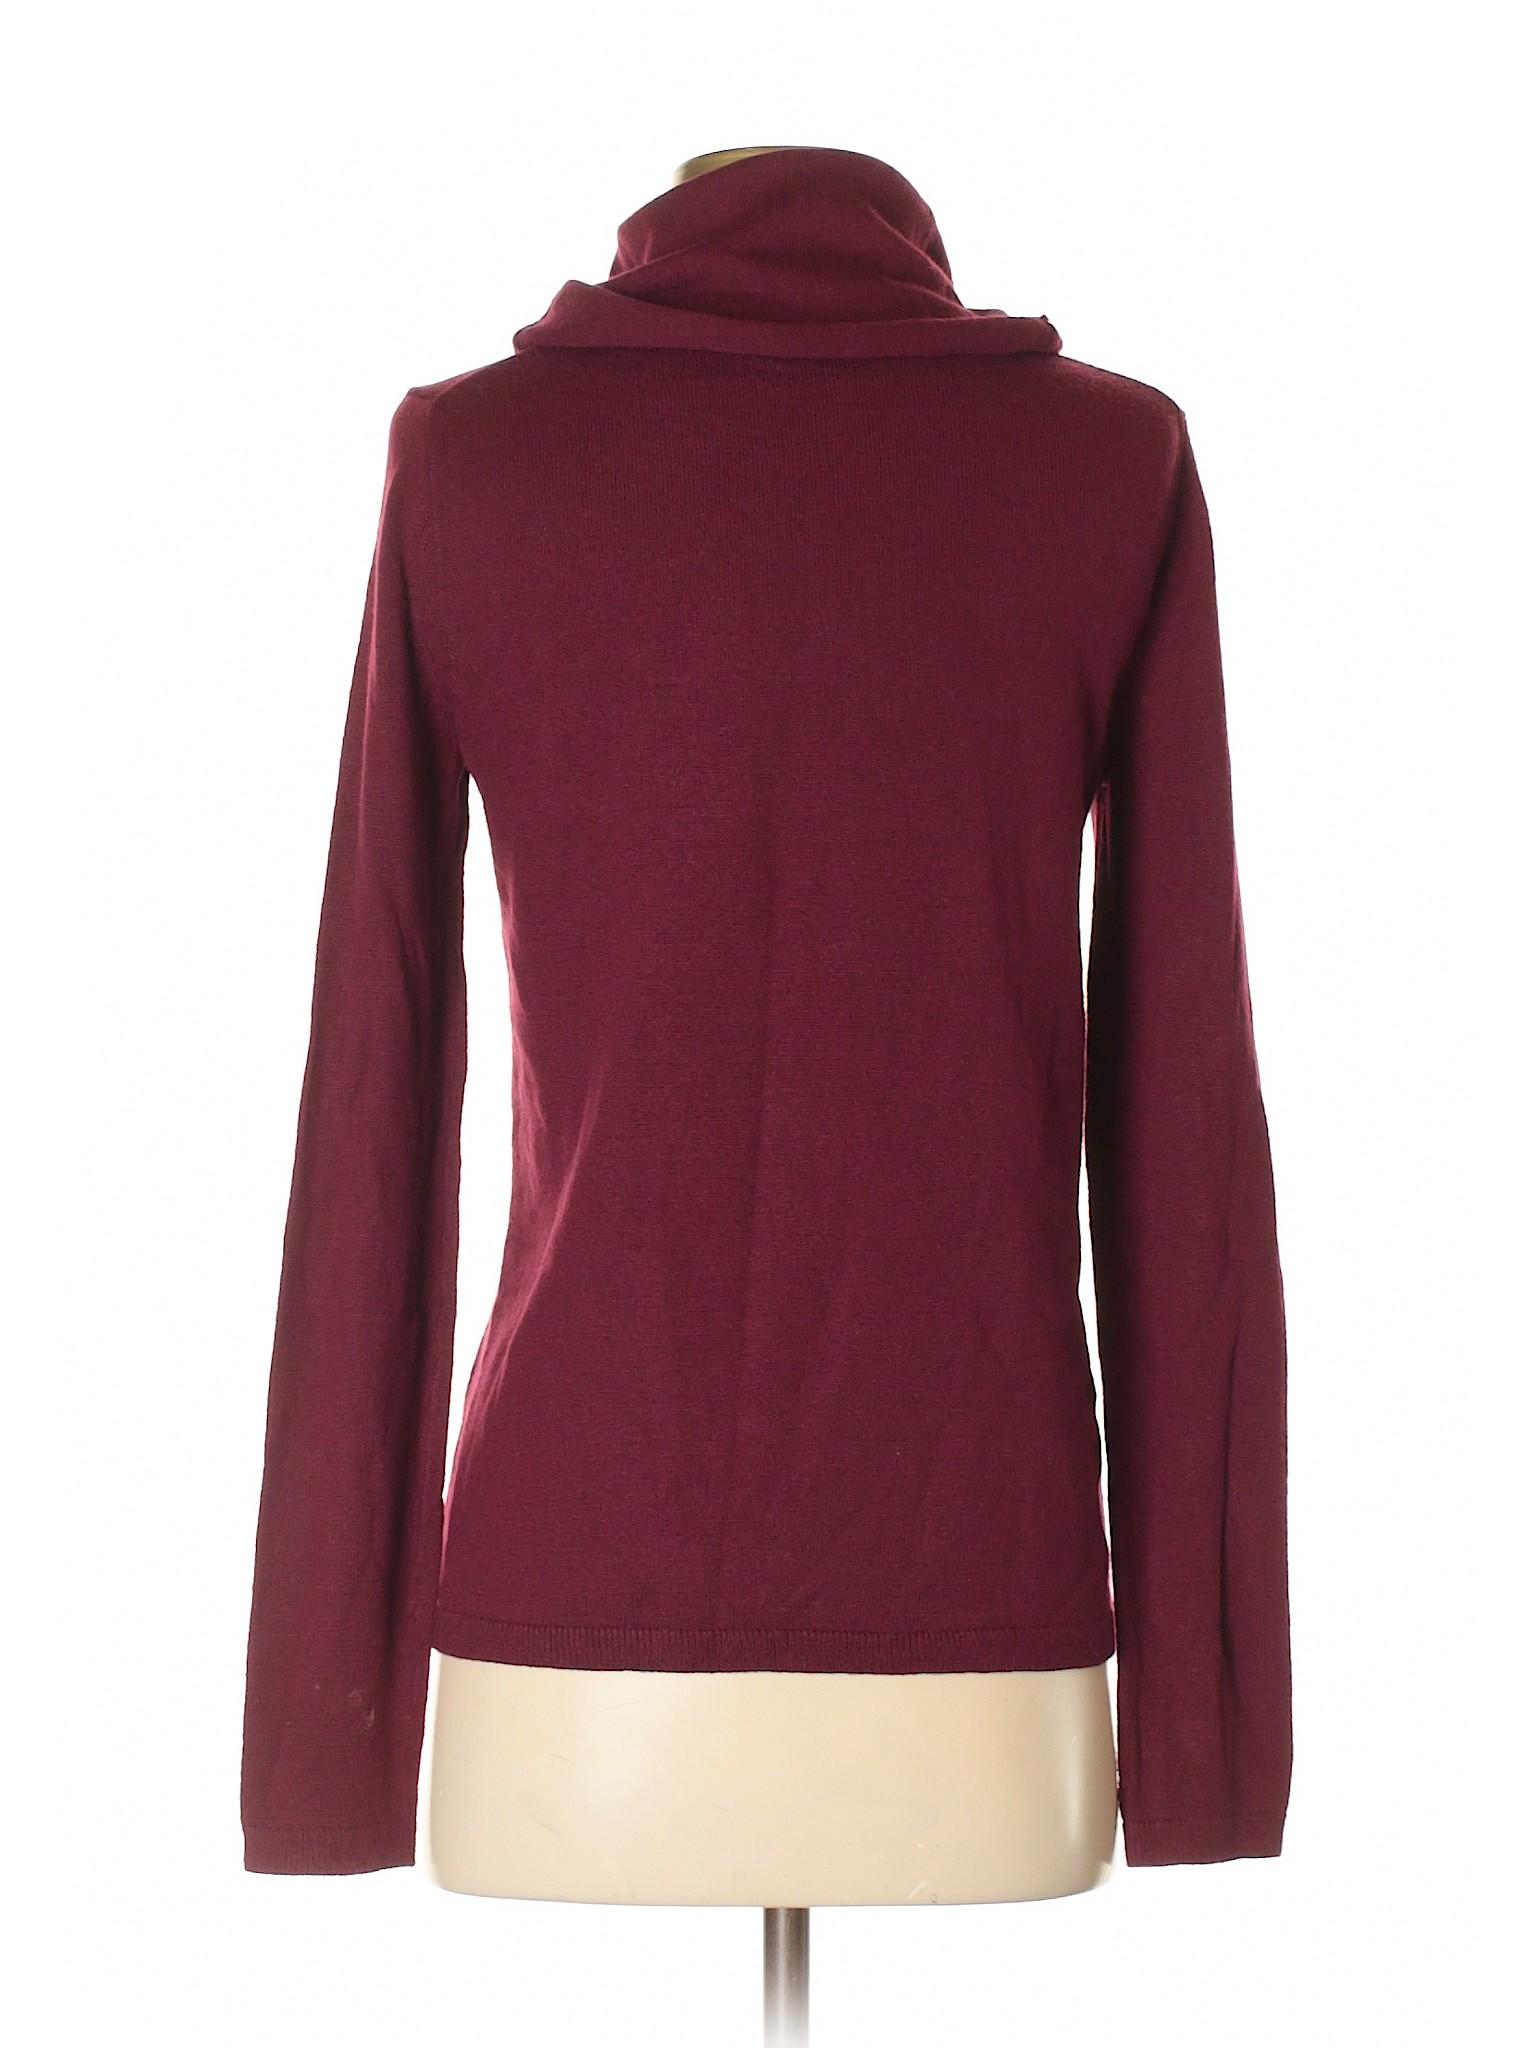 Sweater Boutique Taylor winter LOFT Ann Pullover ggBqv